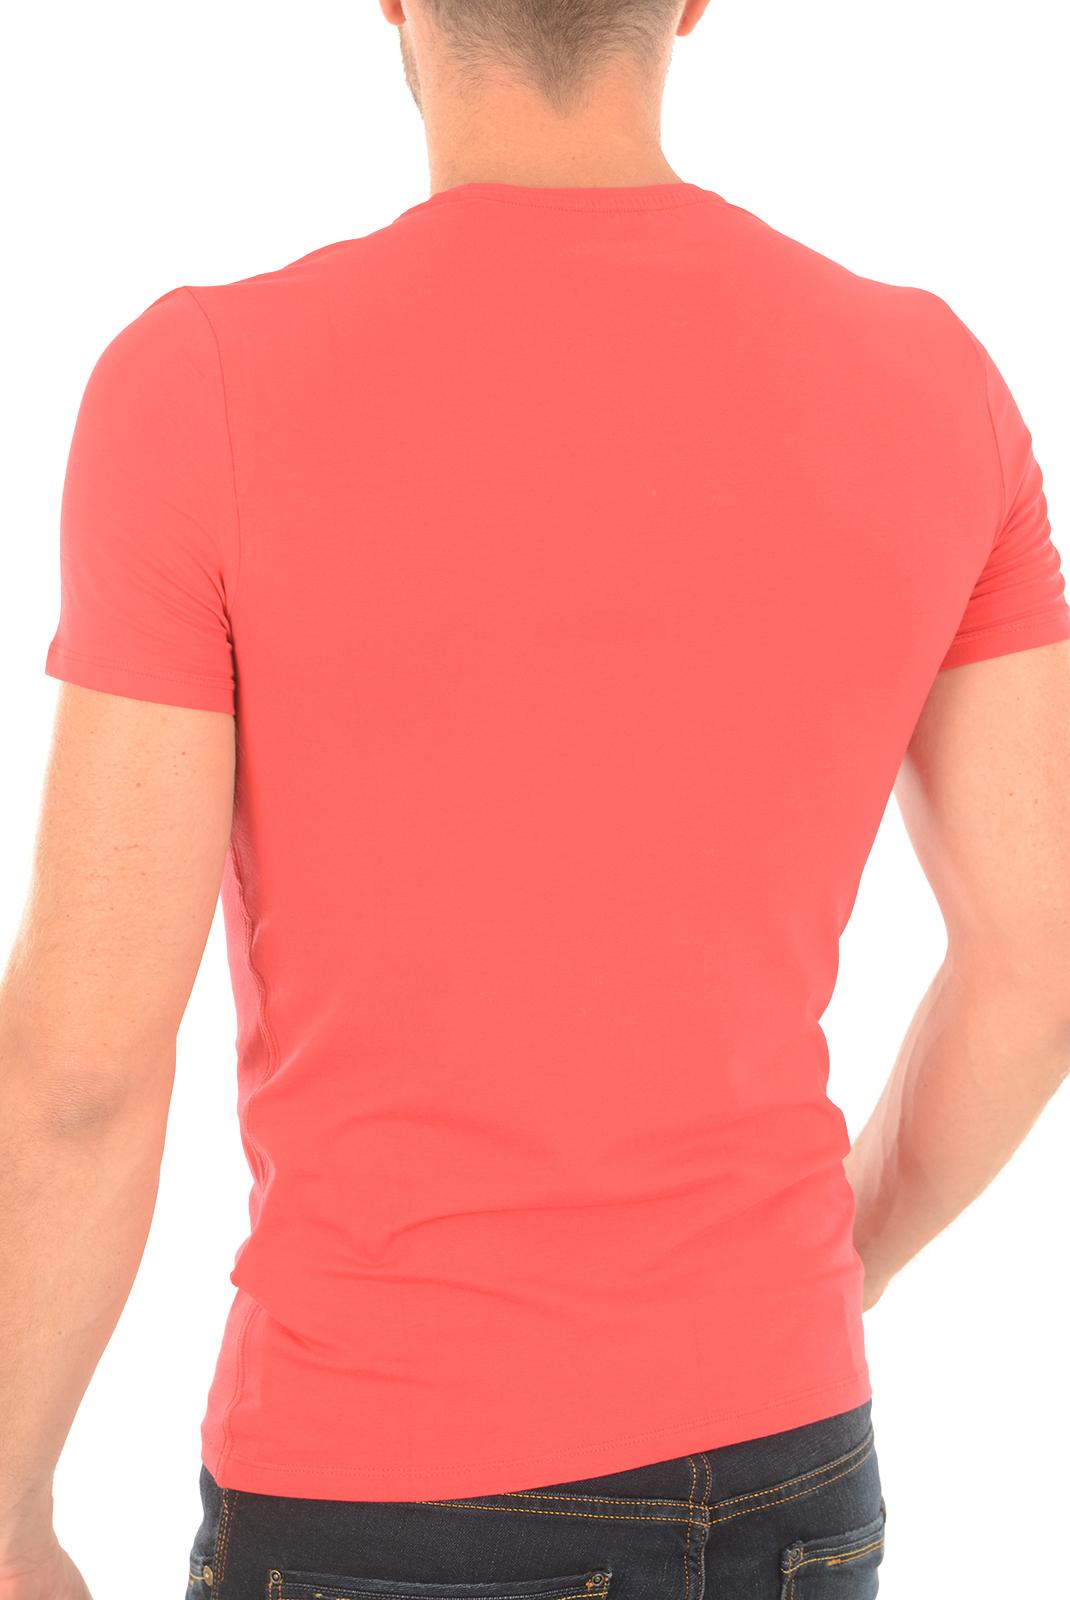 T-S manches courtes  Guess jeans M73I55 J1300 C502 ROUGE